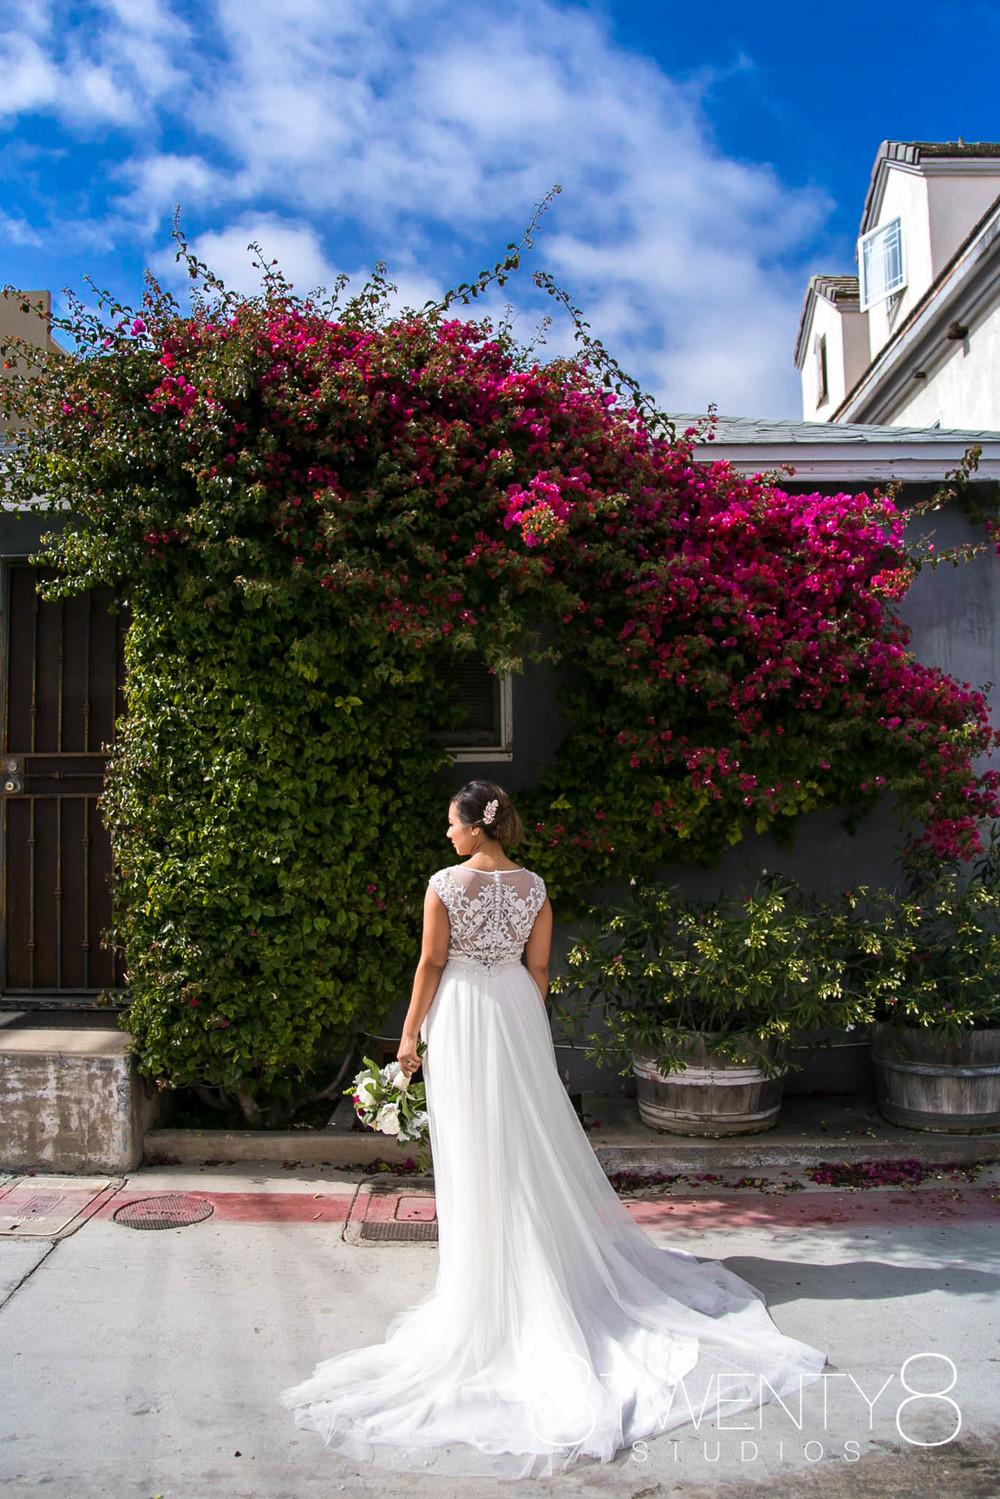 160520-andrea-vincent-wedding-©8twenty8-Studios-0021.jpg